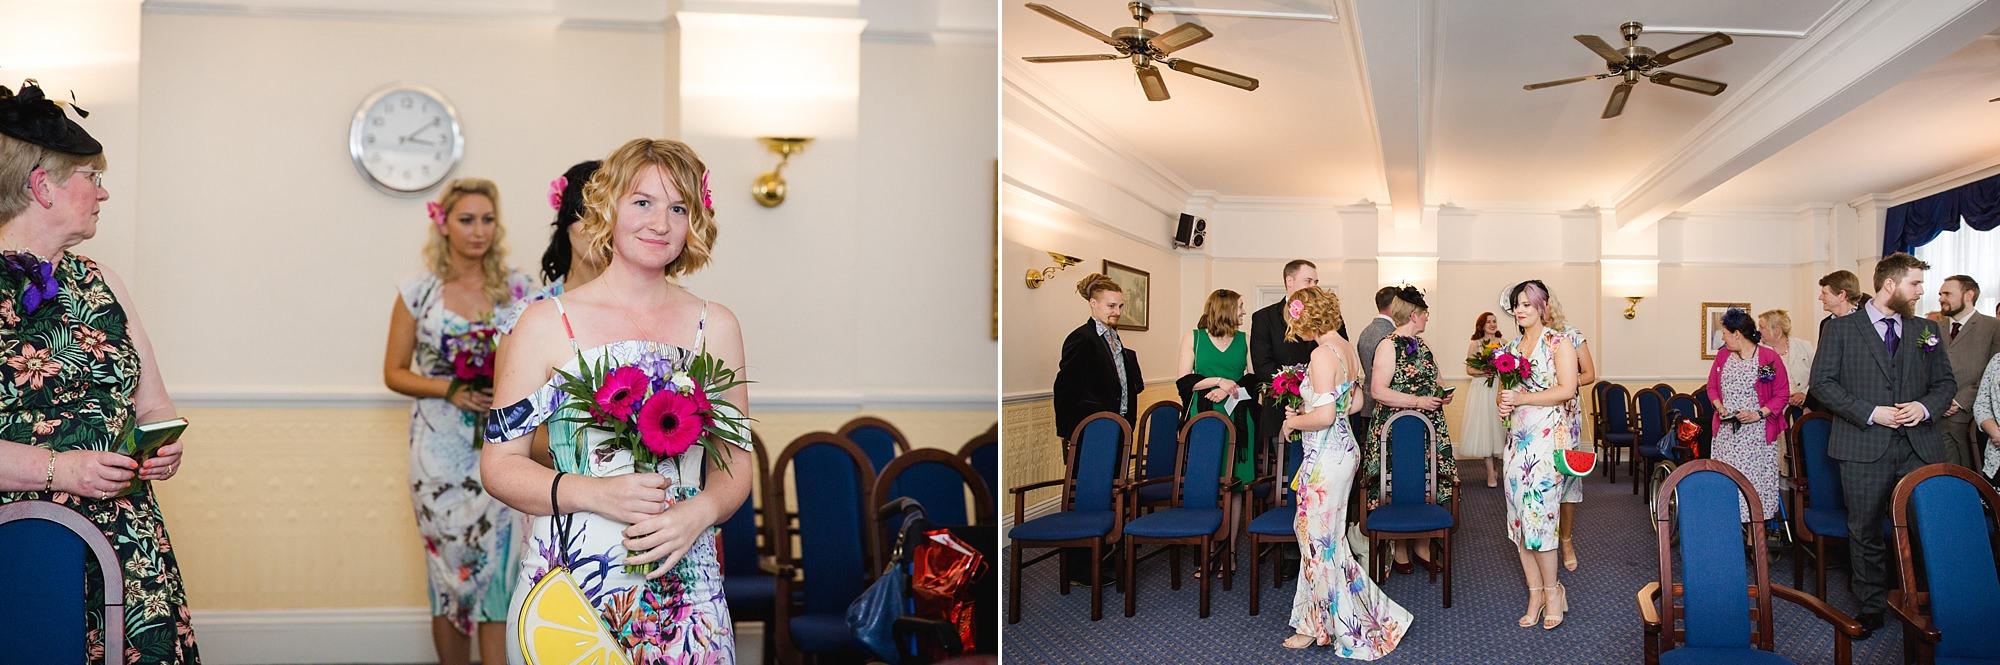 The Grange Ealing wedding bridesmaids walk down the aisle